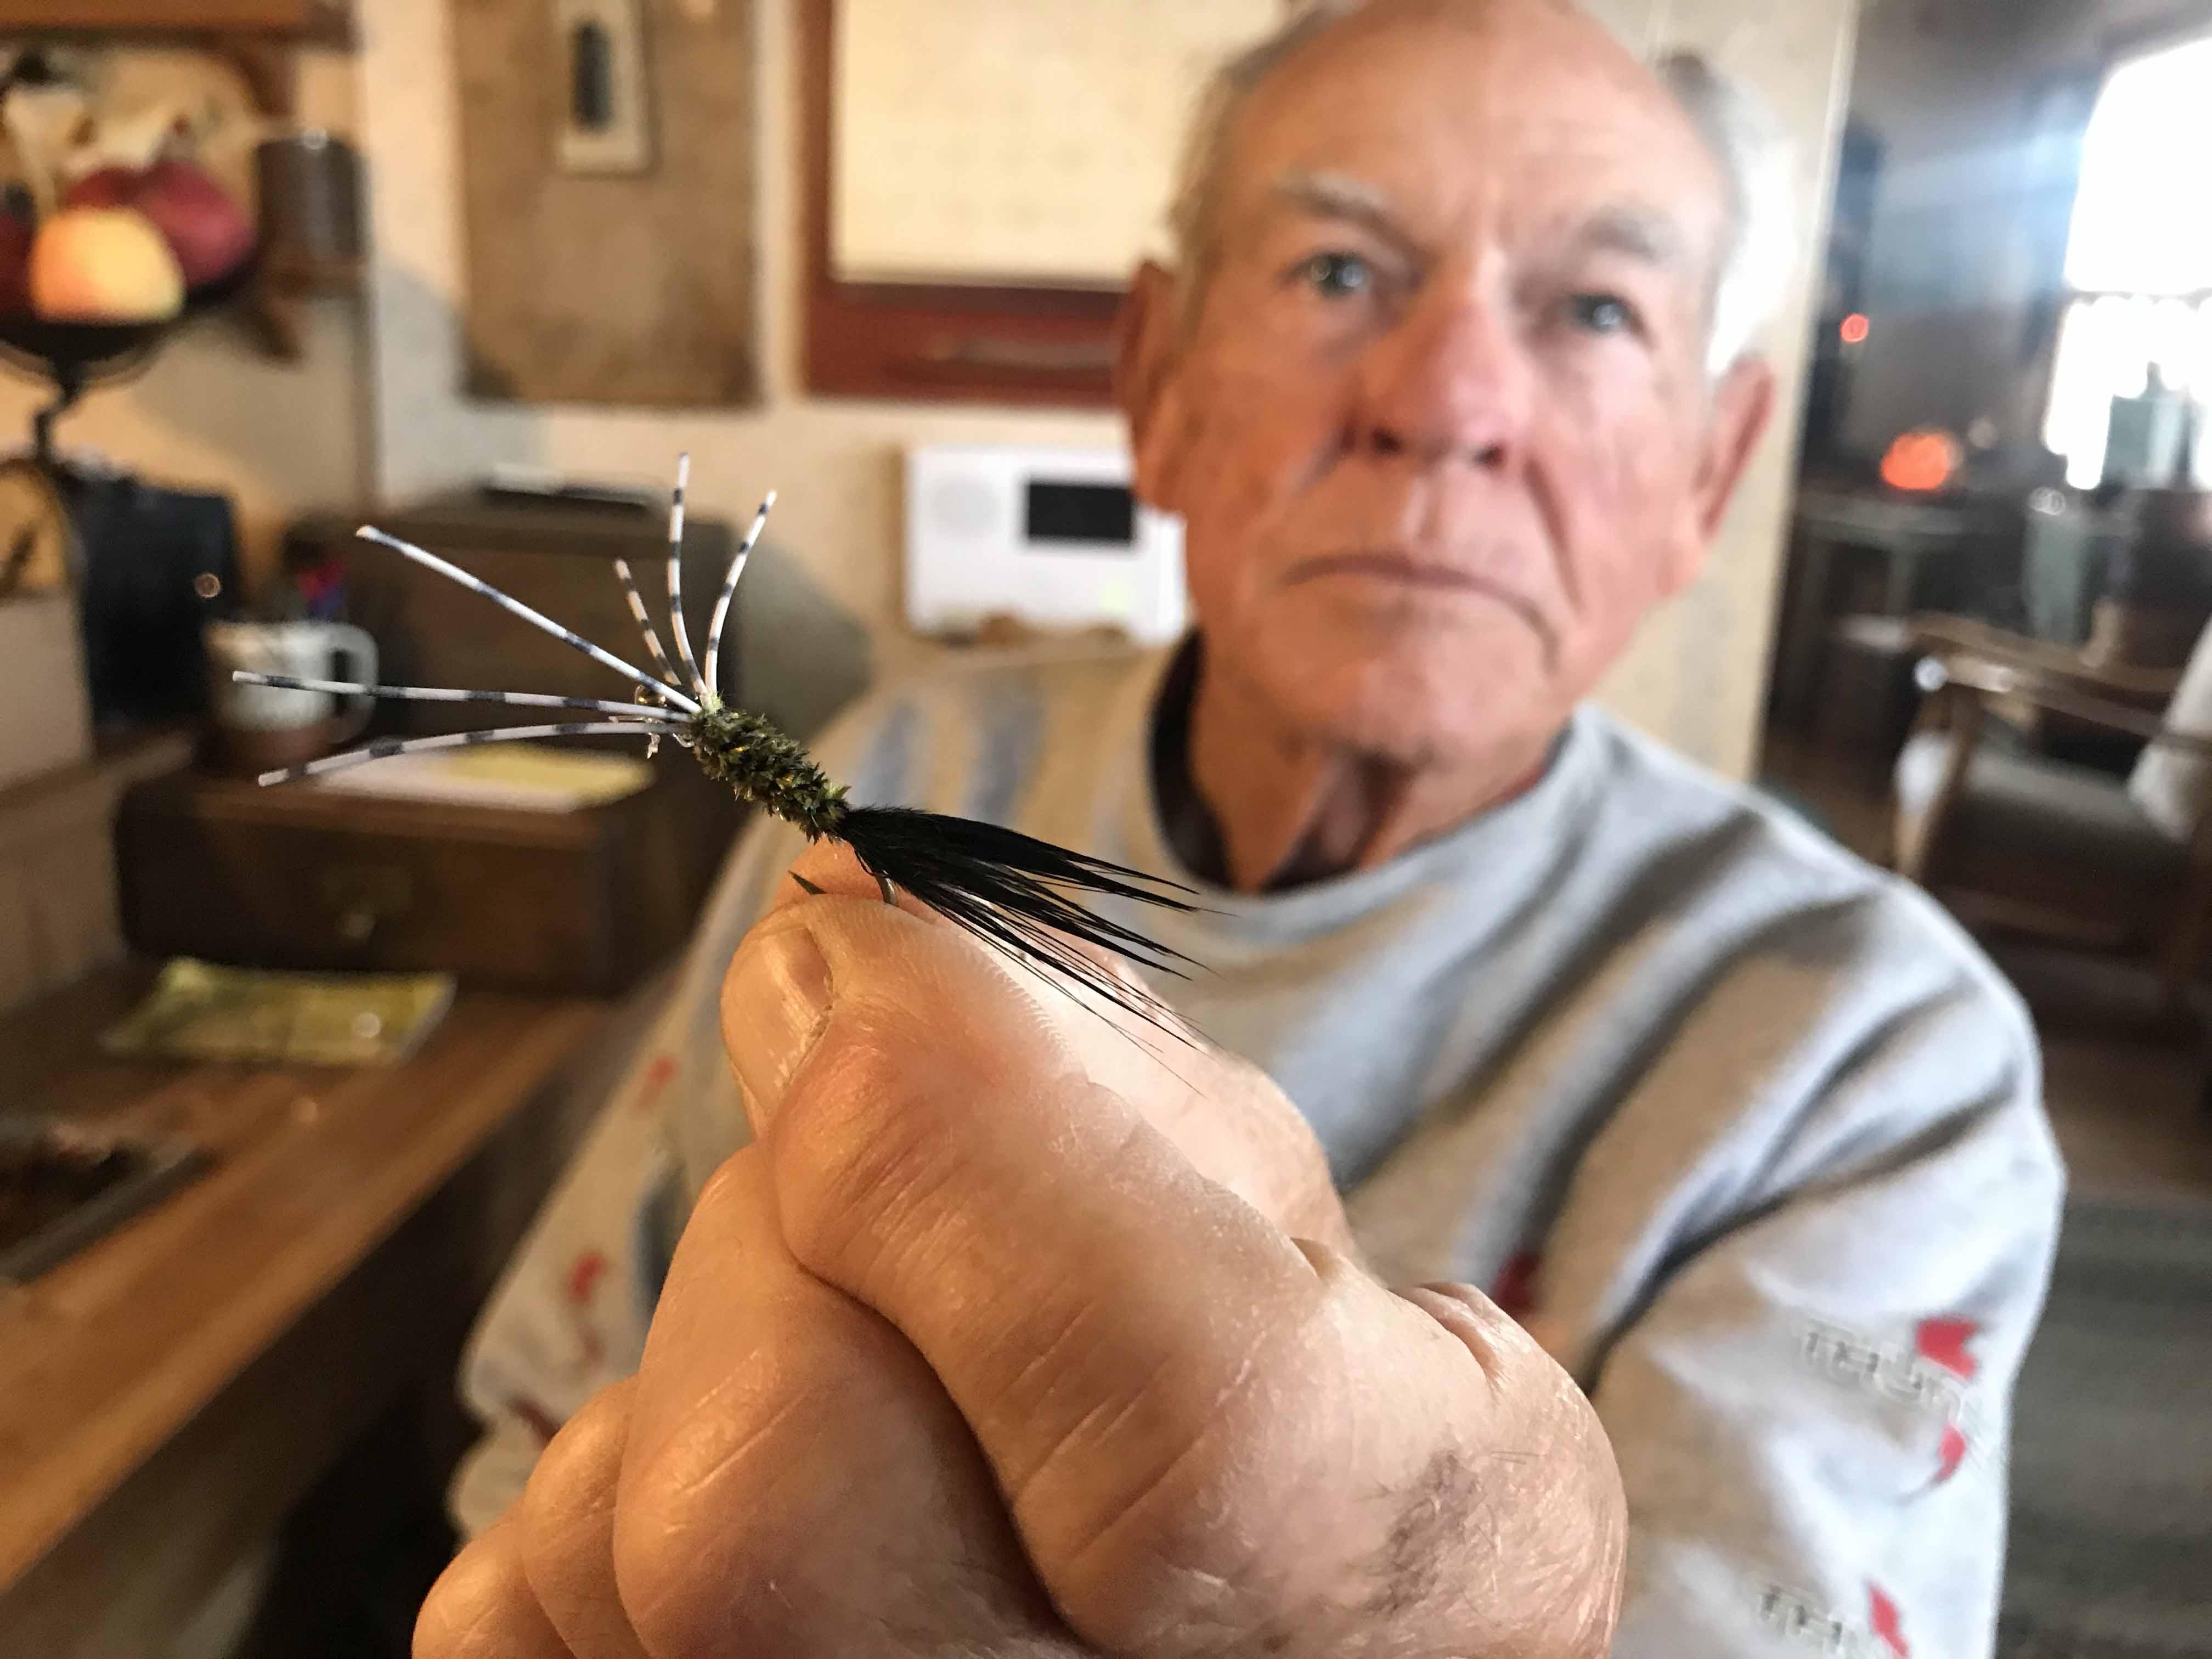 John Branshaw holding up a fishing lure close to the camera.